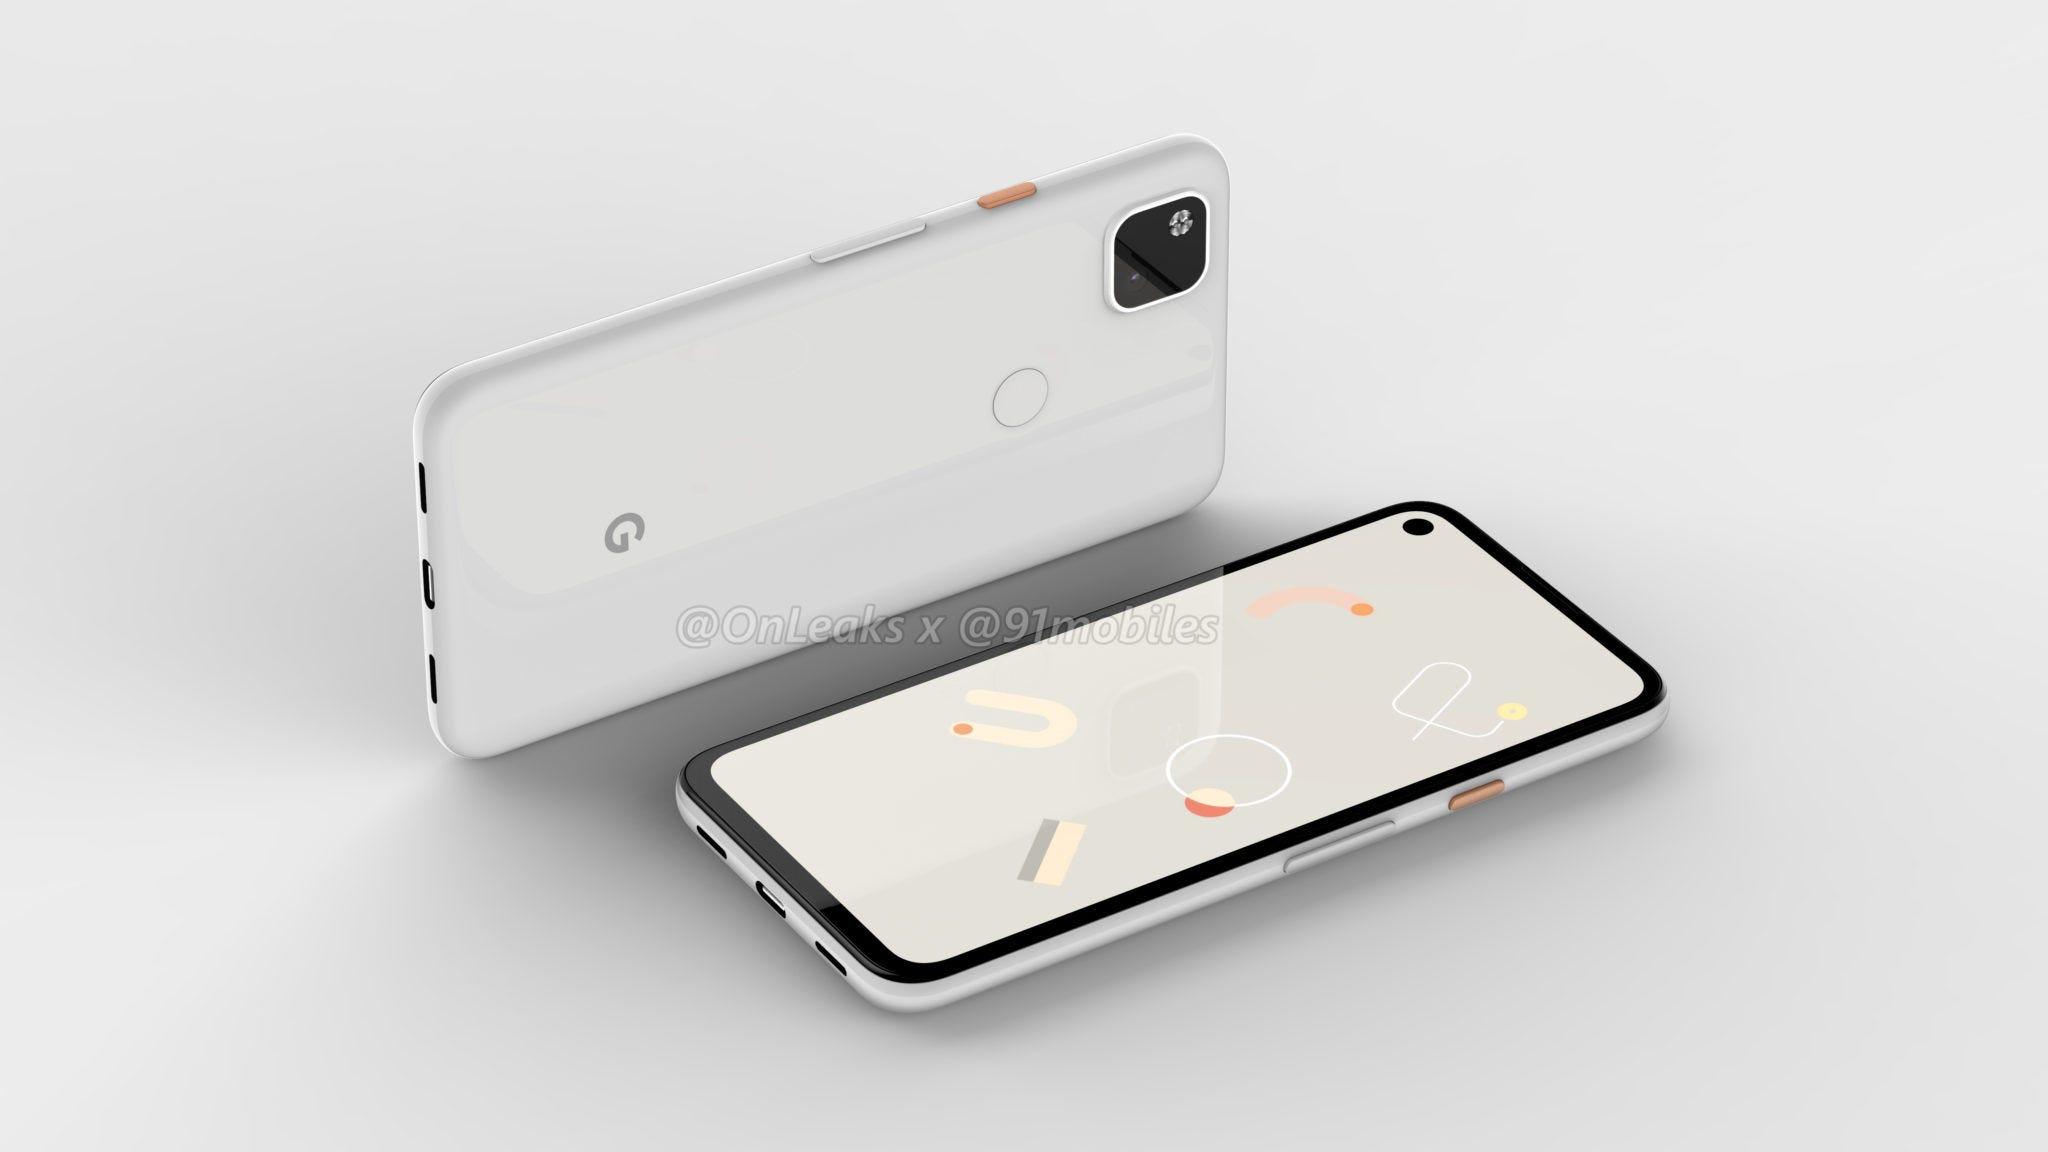 The Google Pixel 4a phone